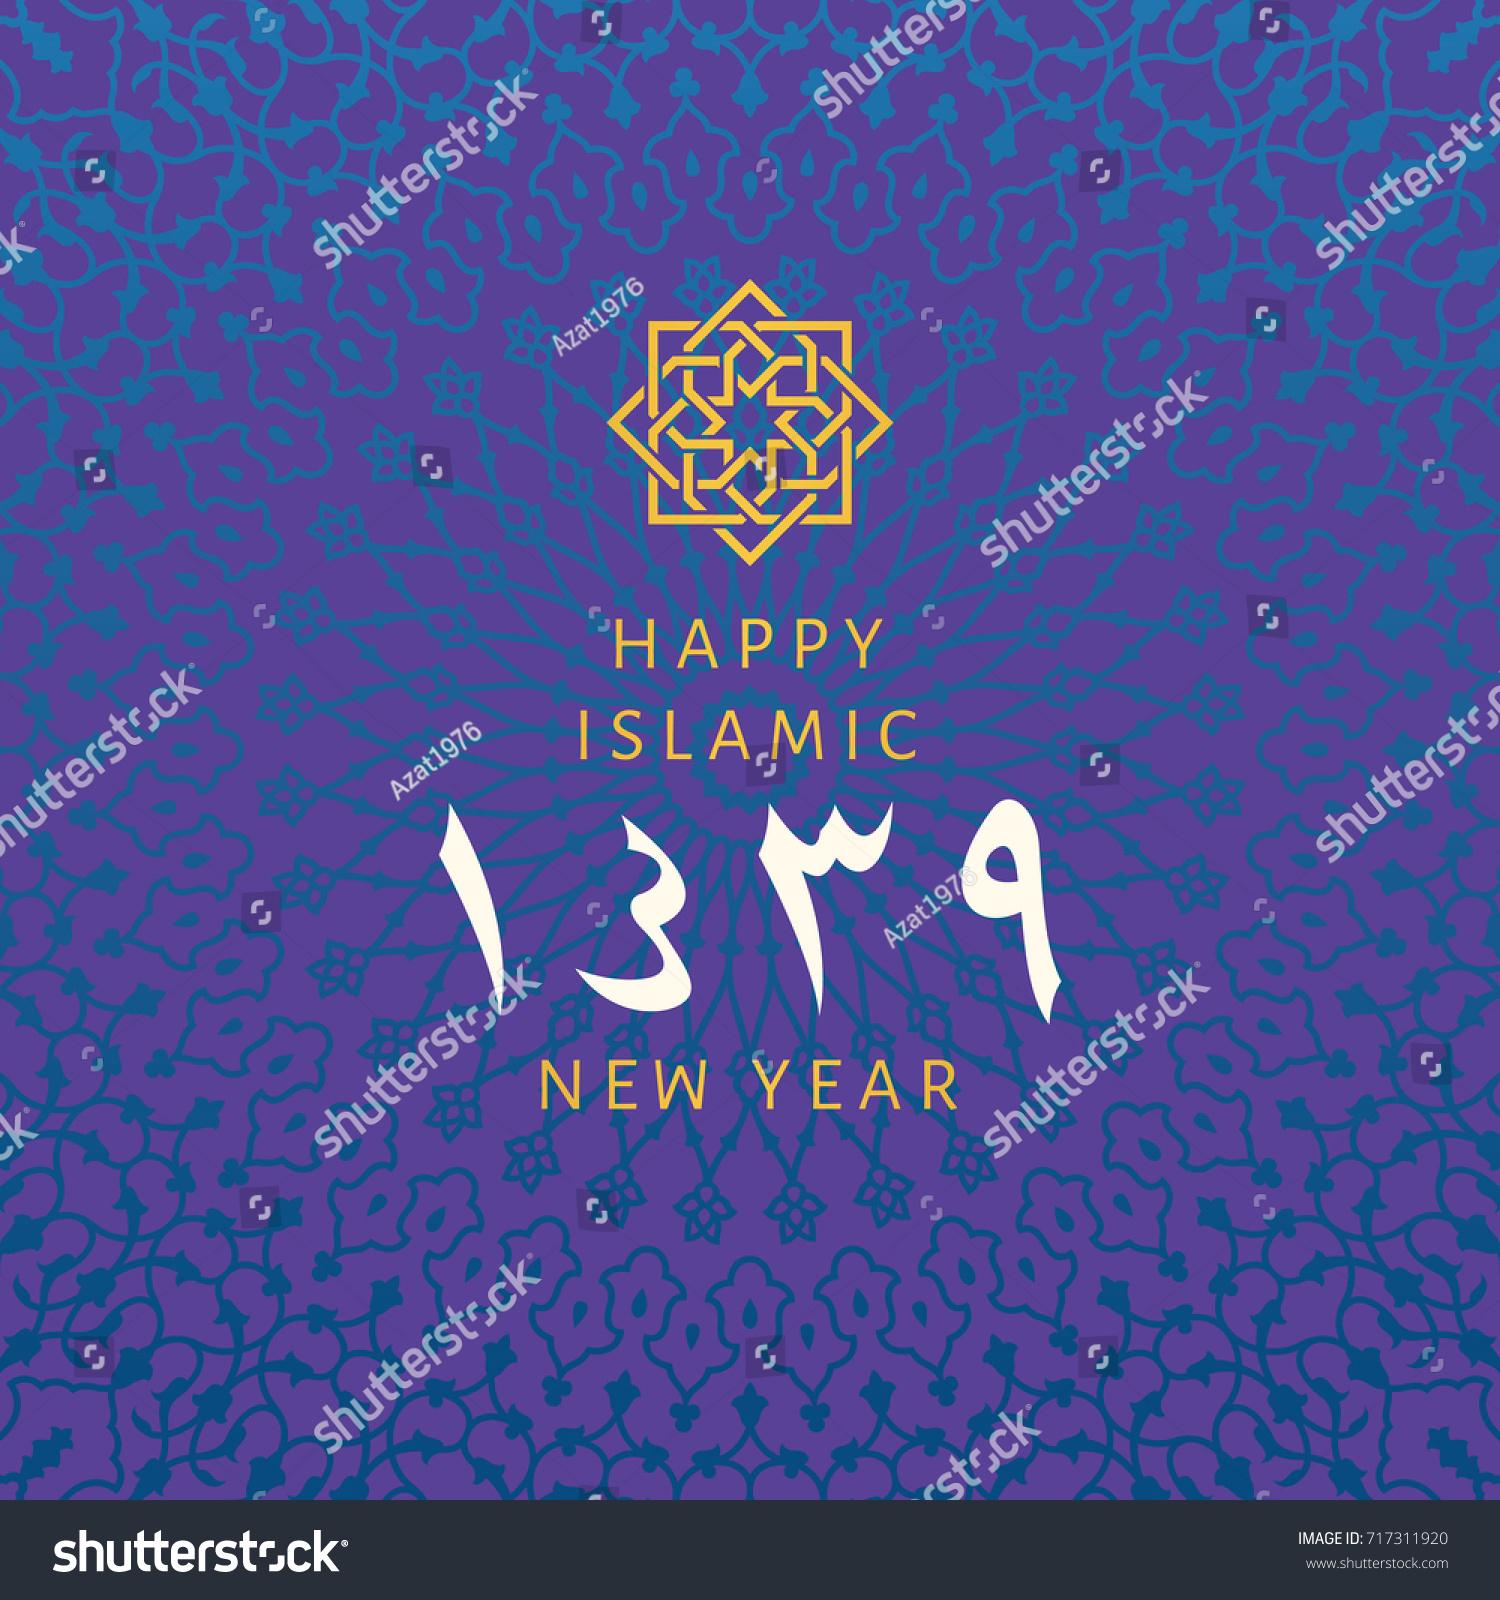 1439 Hijri Islamic New Year Happy Stock Vector 717311920 Shutterstock